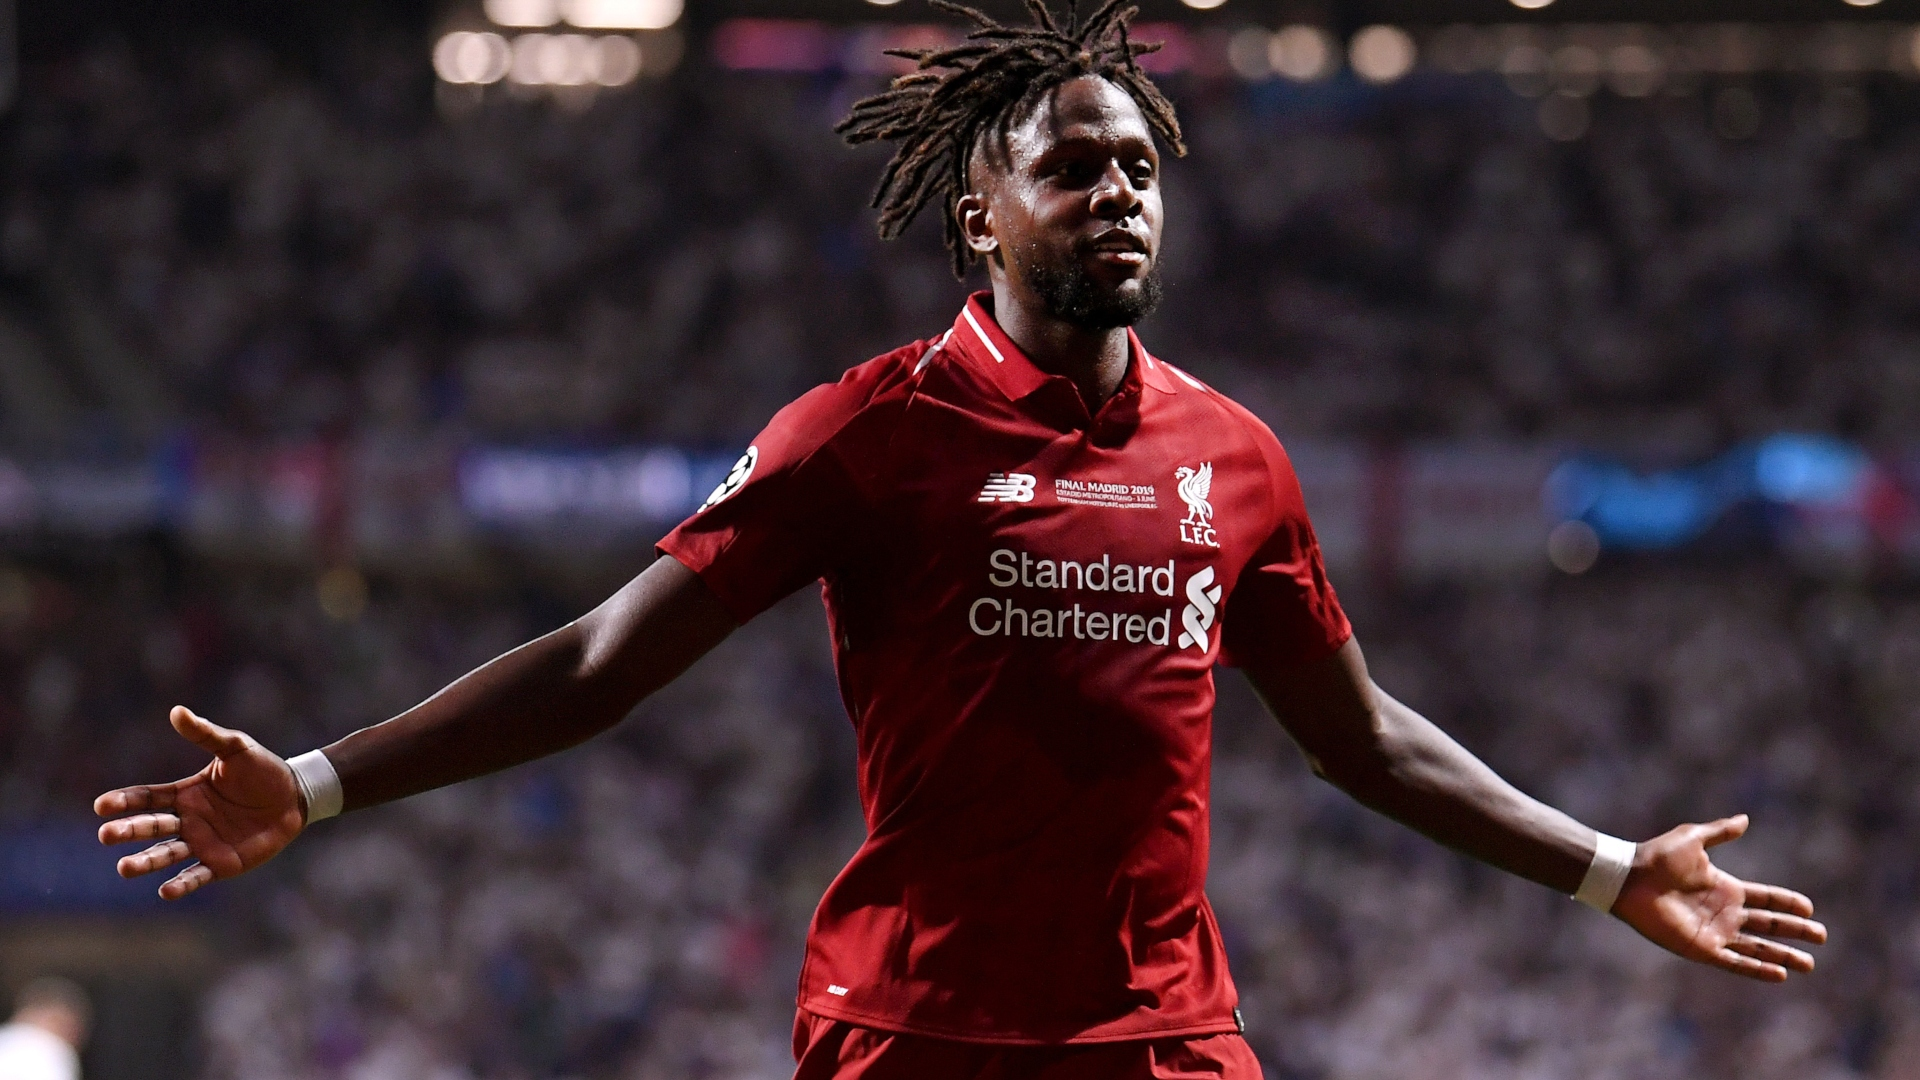 Liverpool tottenham free tv